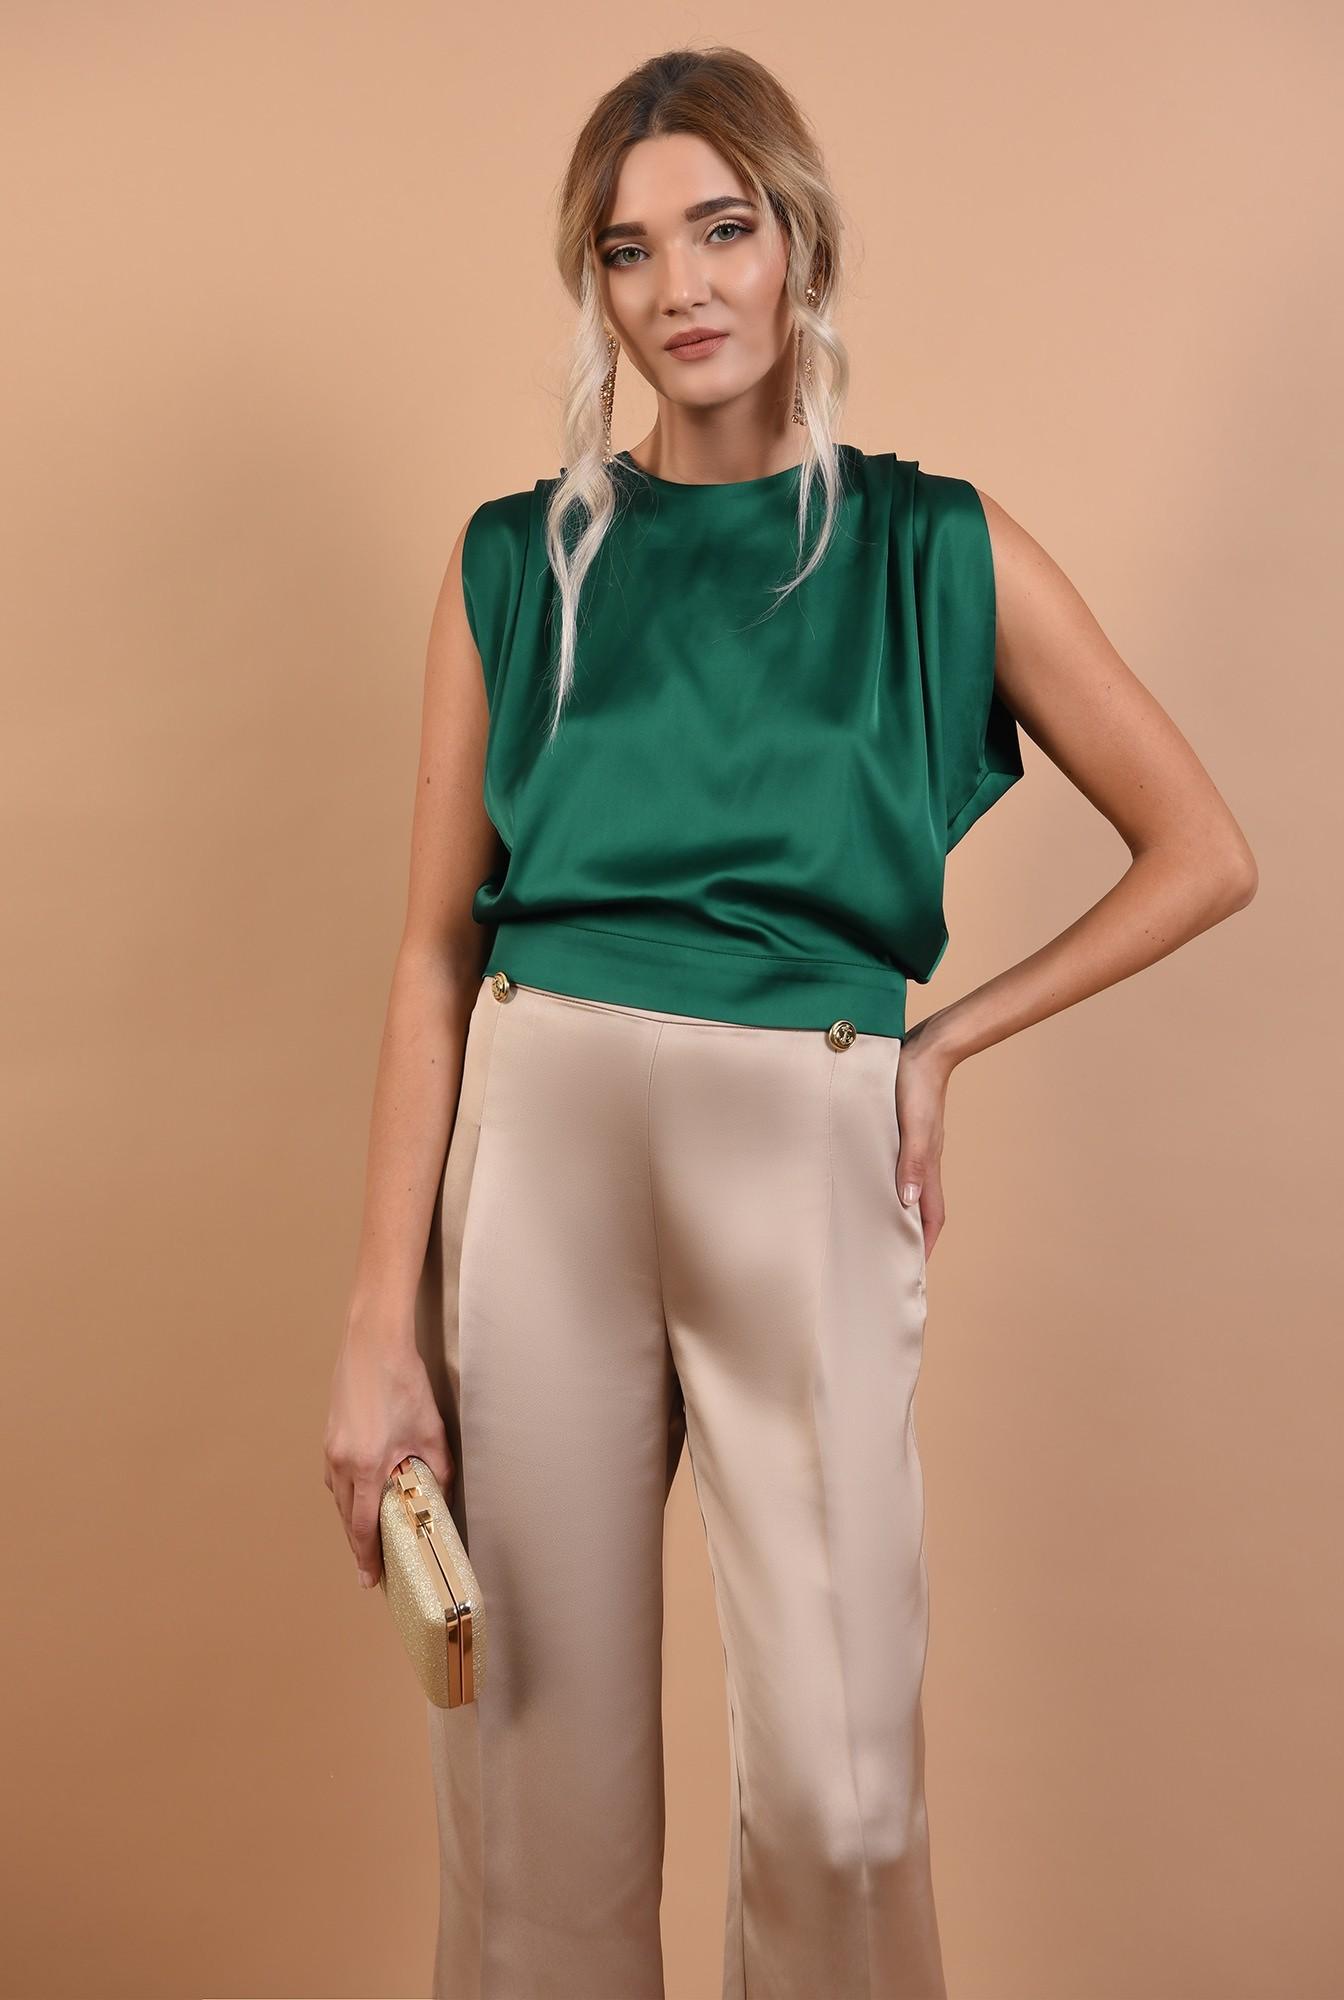 0 - bluza de seara, cu umeri fronsati, cu funda la spate, Poema, verde